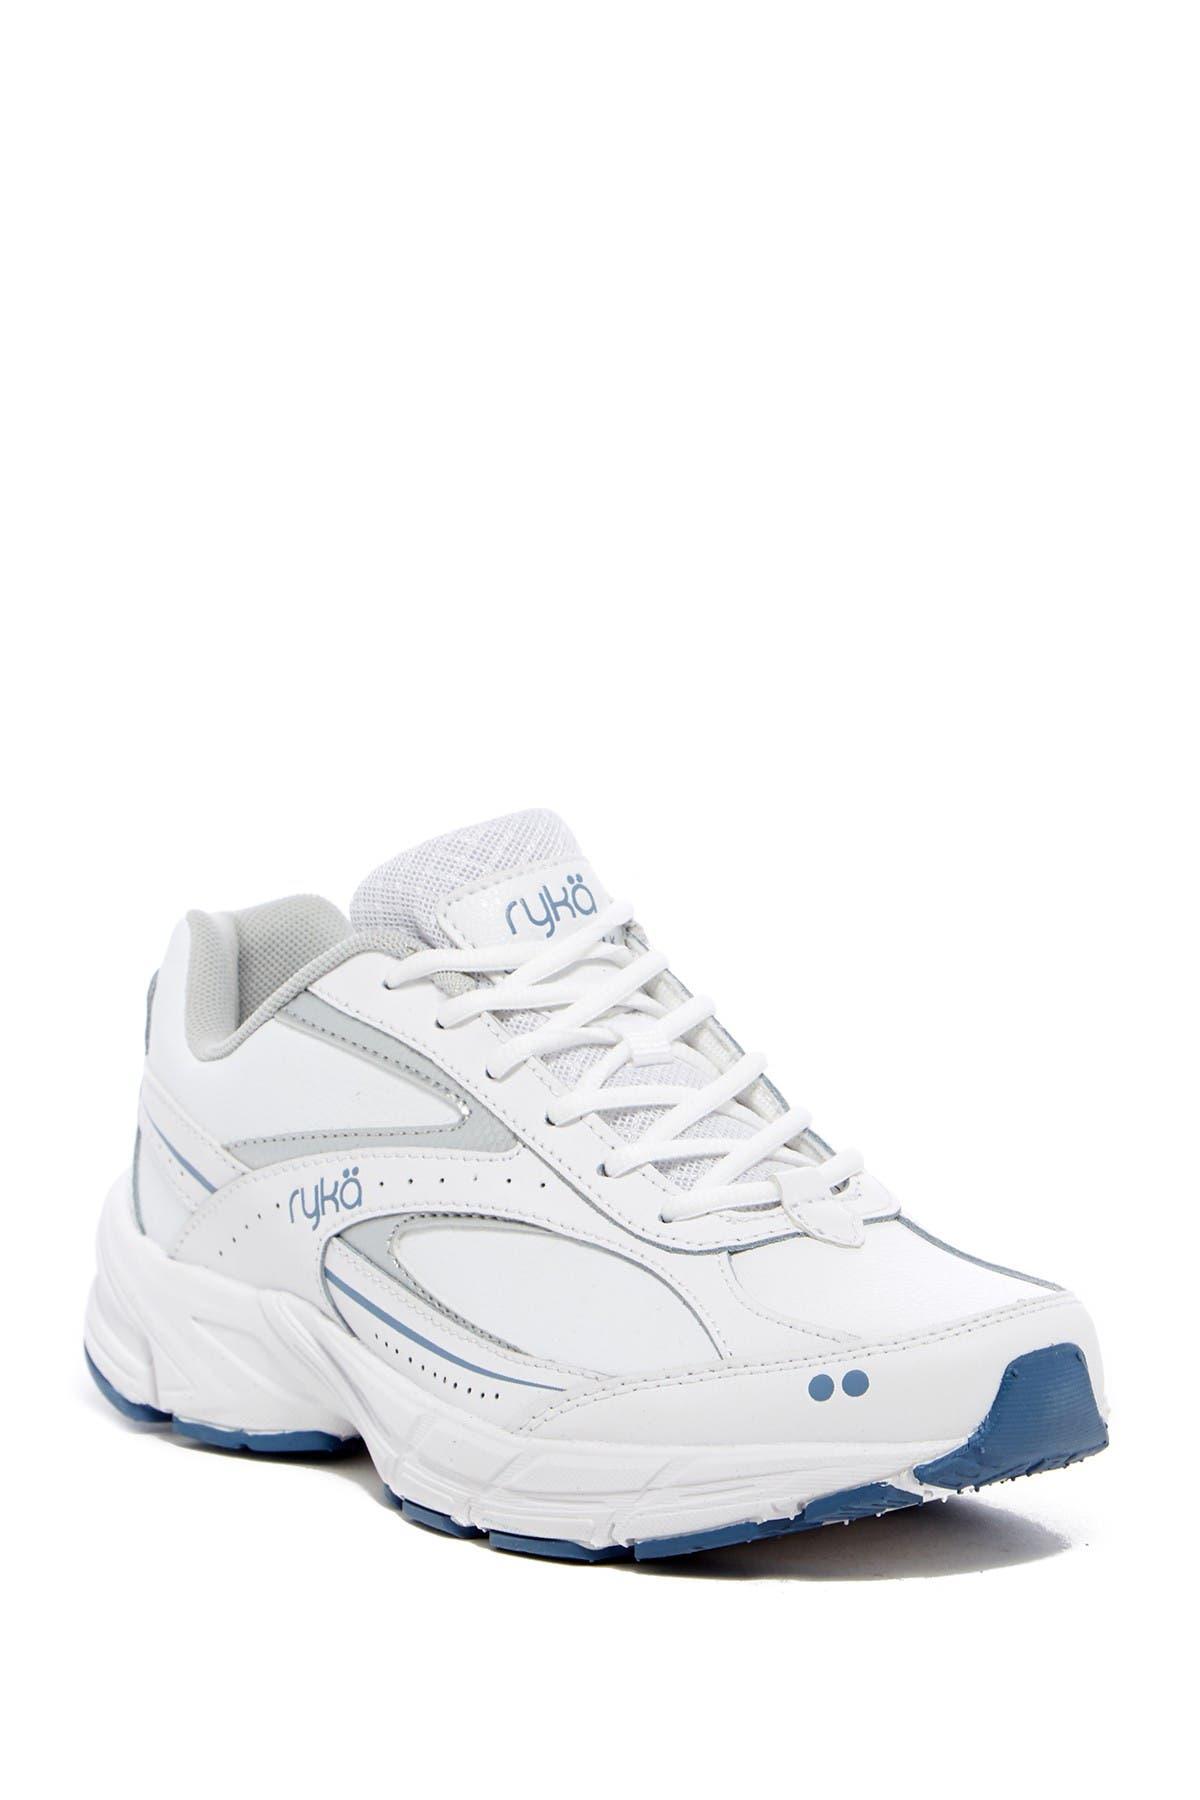 Image of Ryka Comfort Walk Sneaker - Wide Width Available